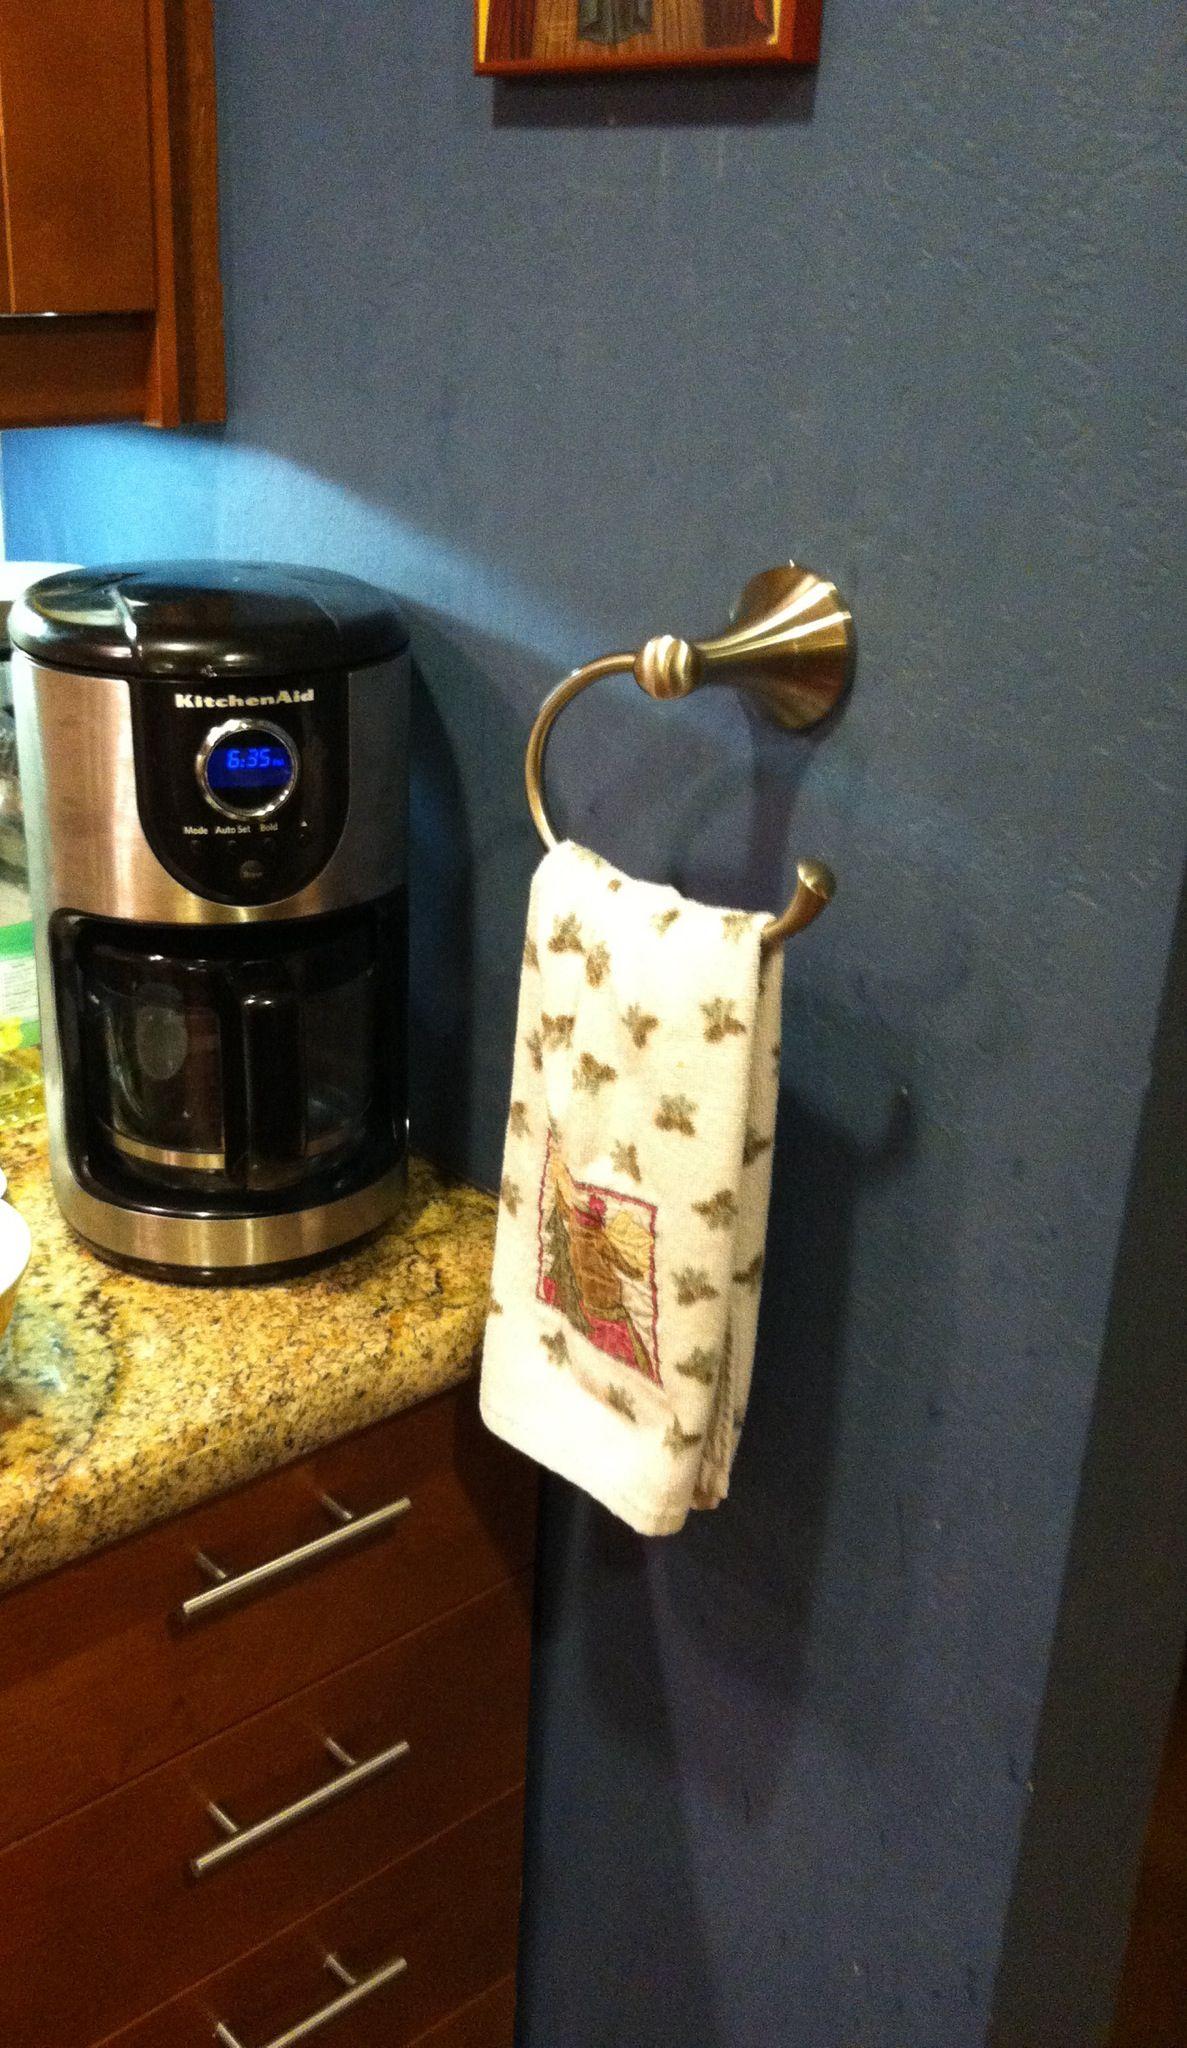 Towel hook in kitchen!!